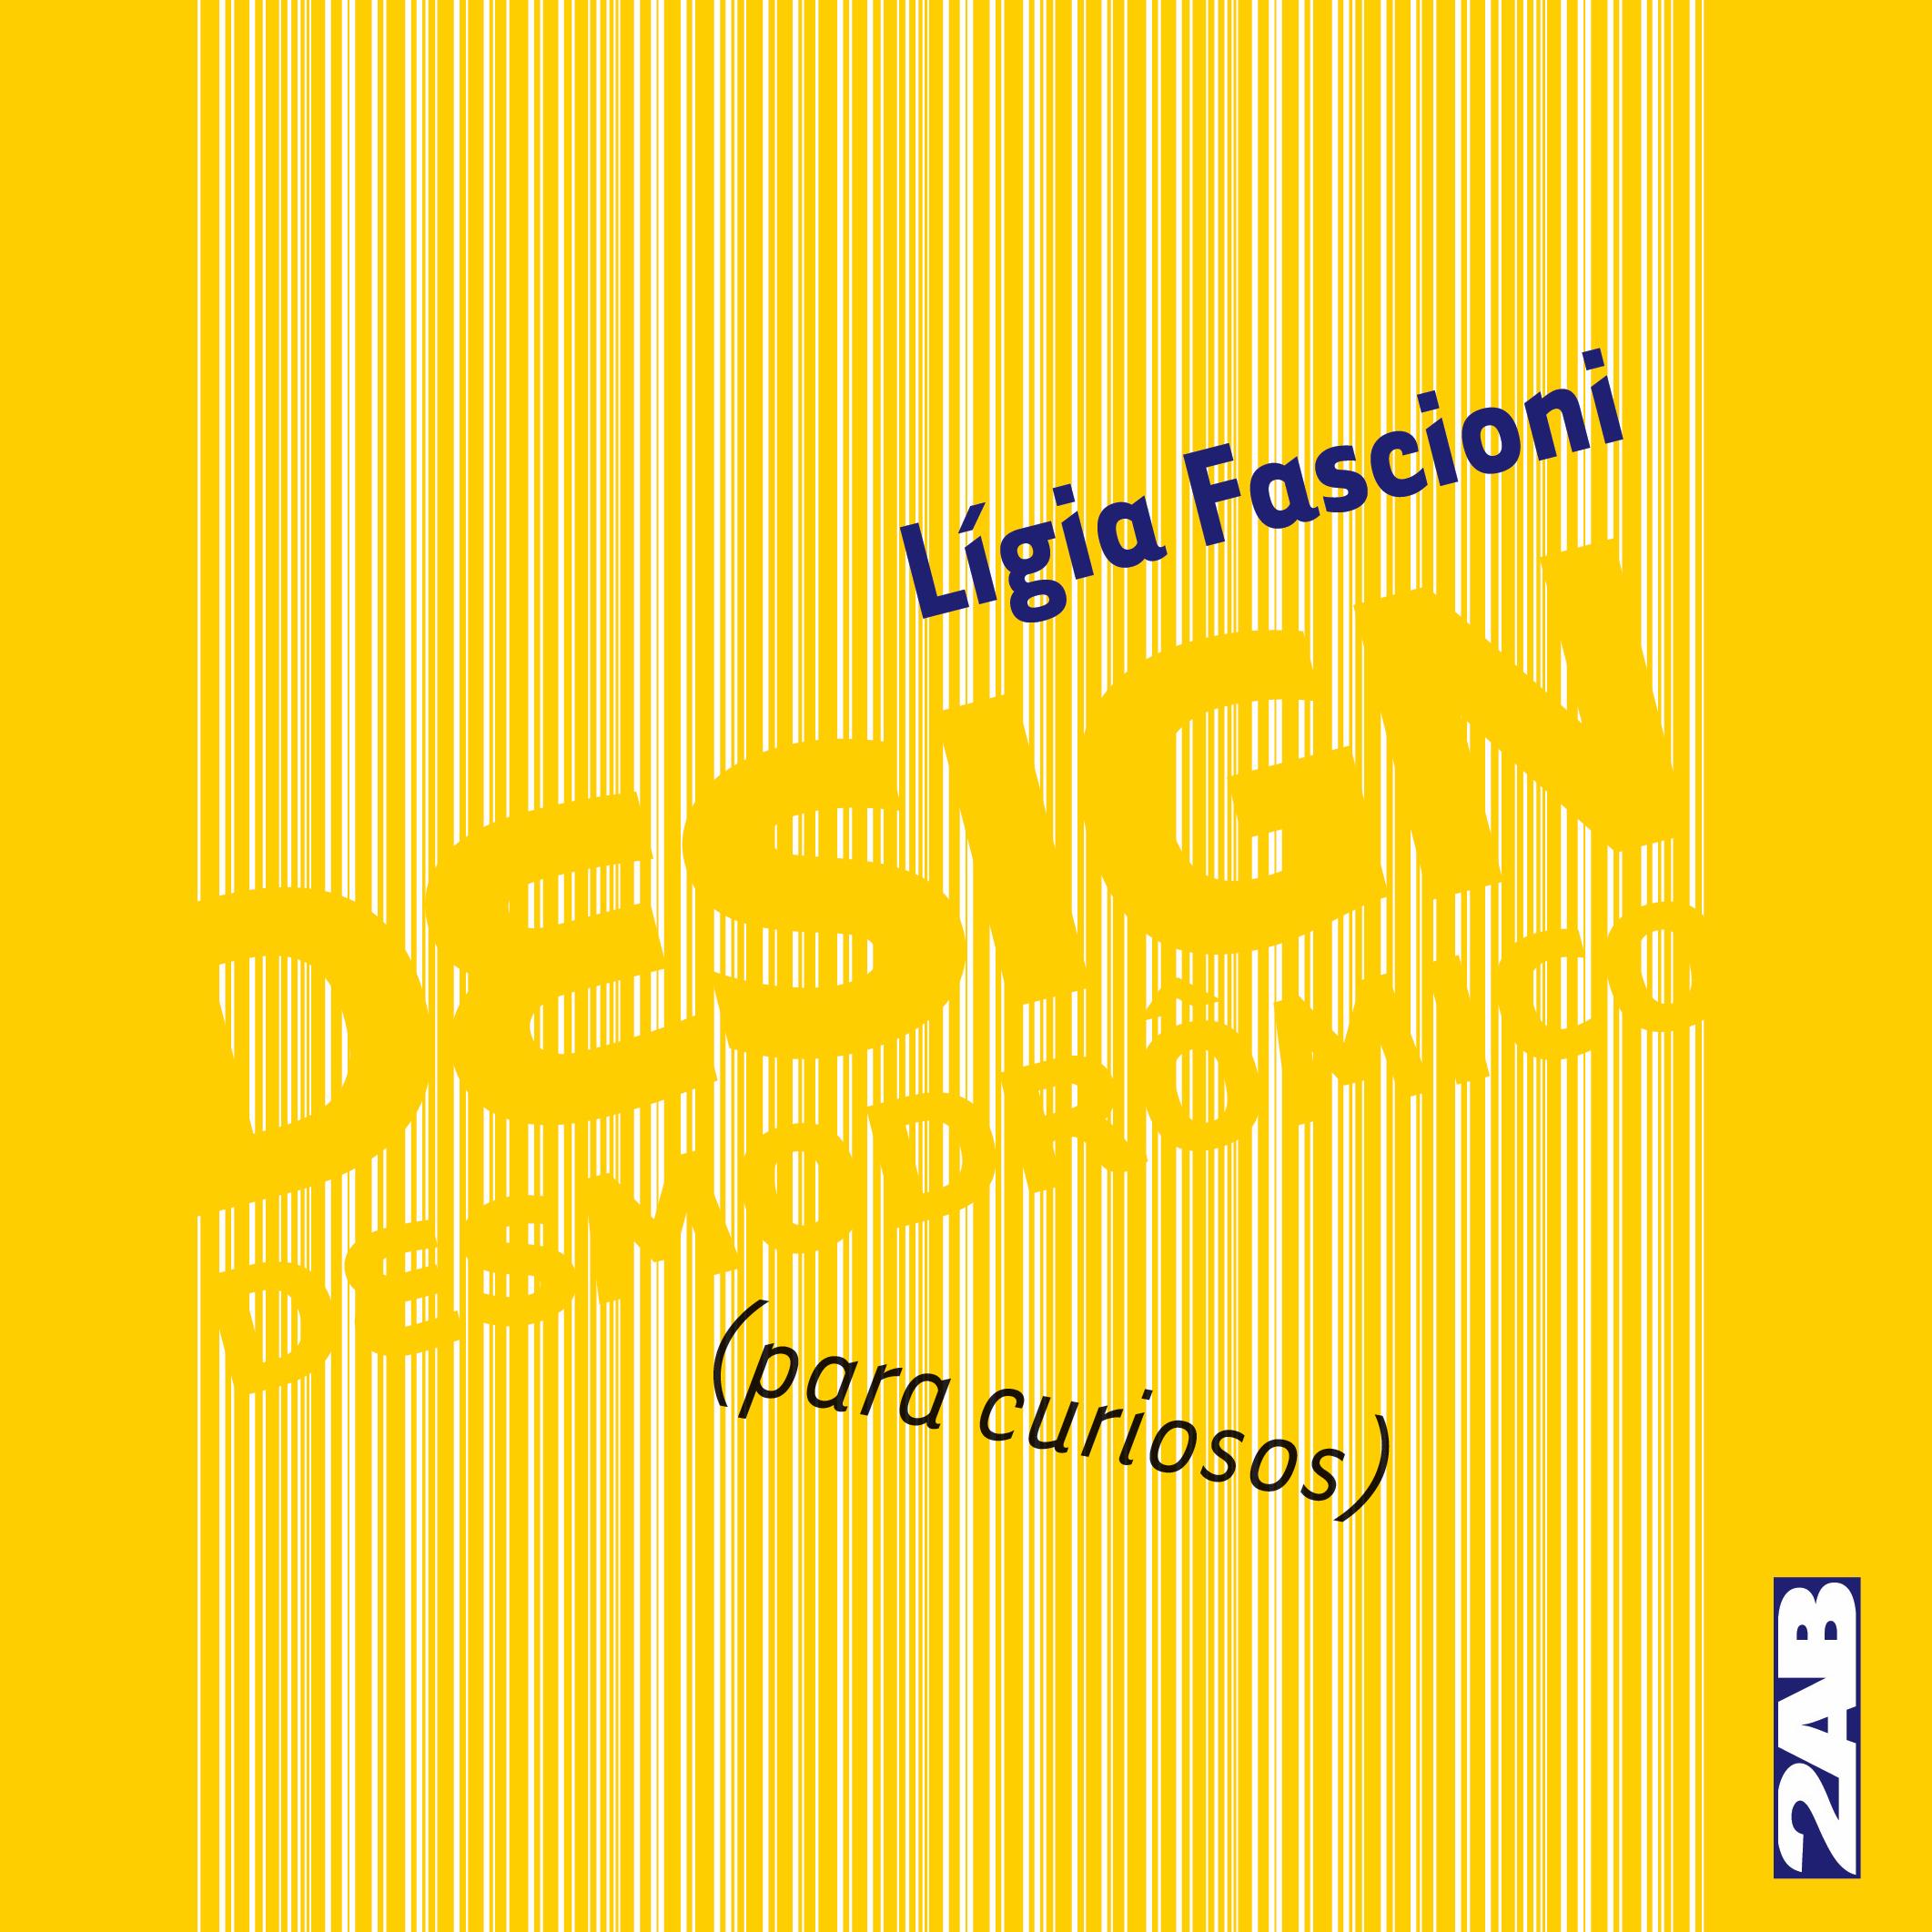 design desmodrômico